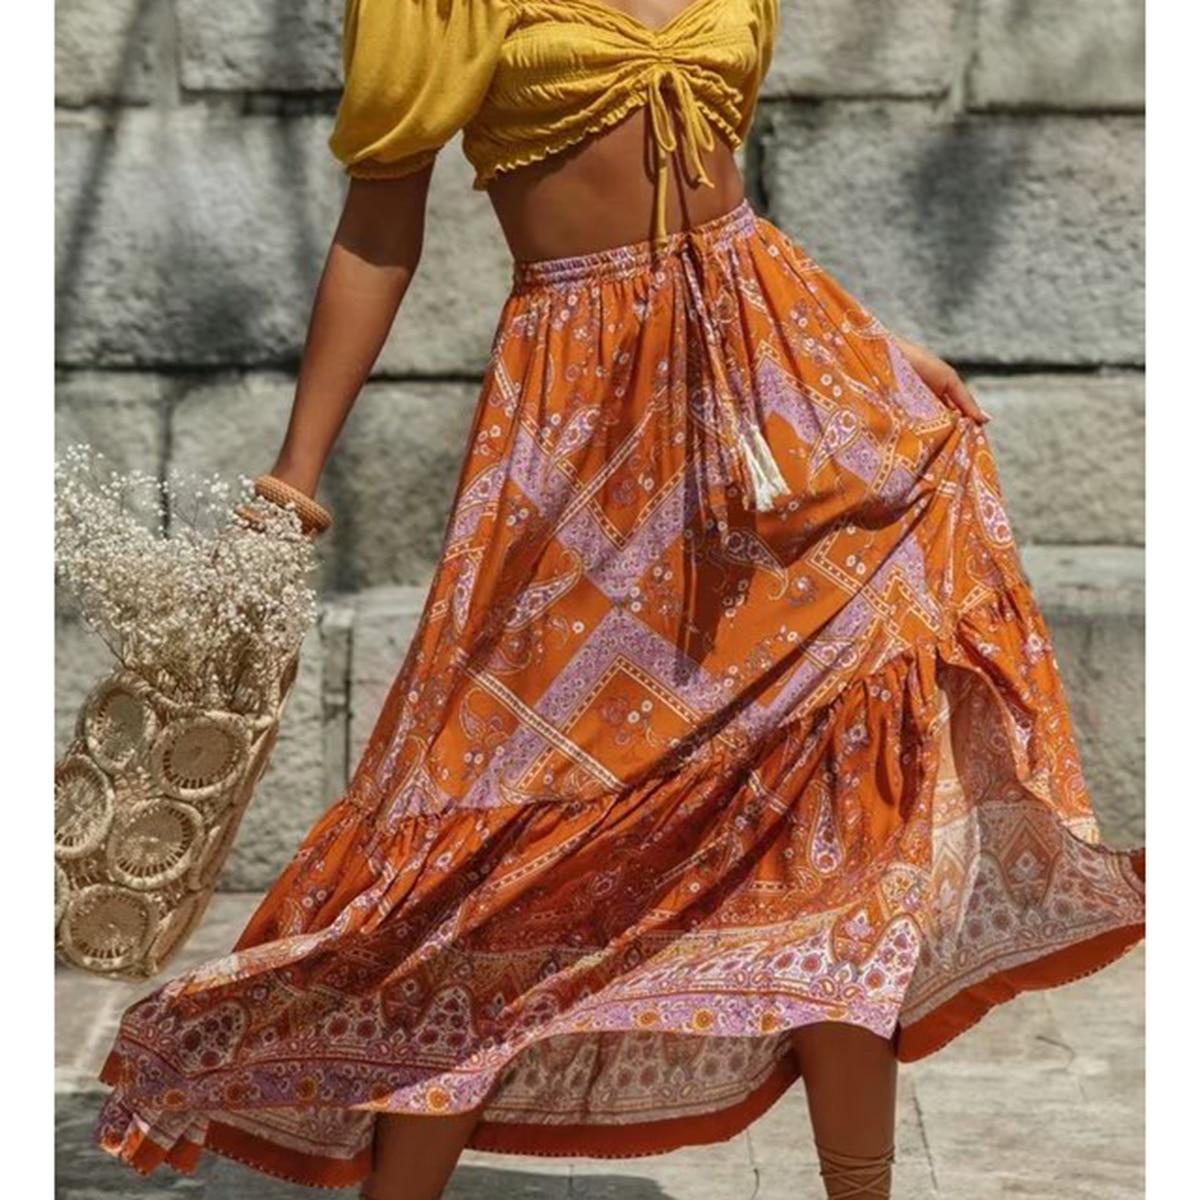 Women Maxi Skirt Cotton Orange Floral Print Split Sexy Summer Skirts Vintage Beach Casual Clothes Boho Long Women Skirts